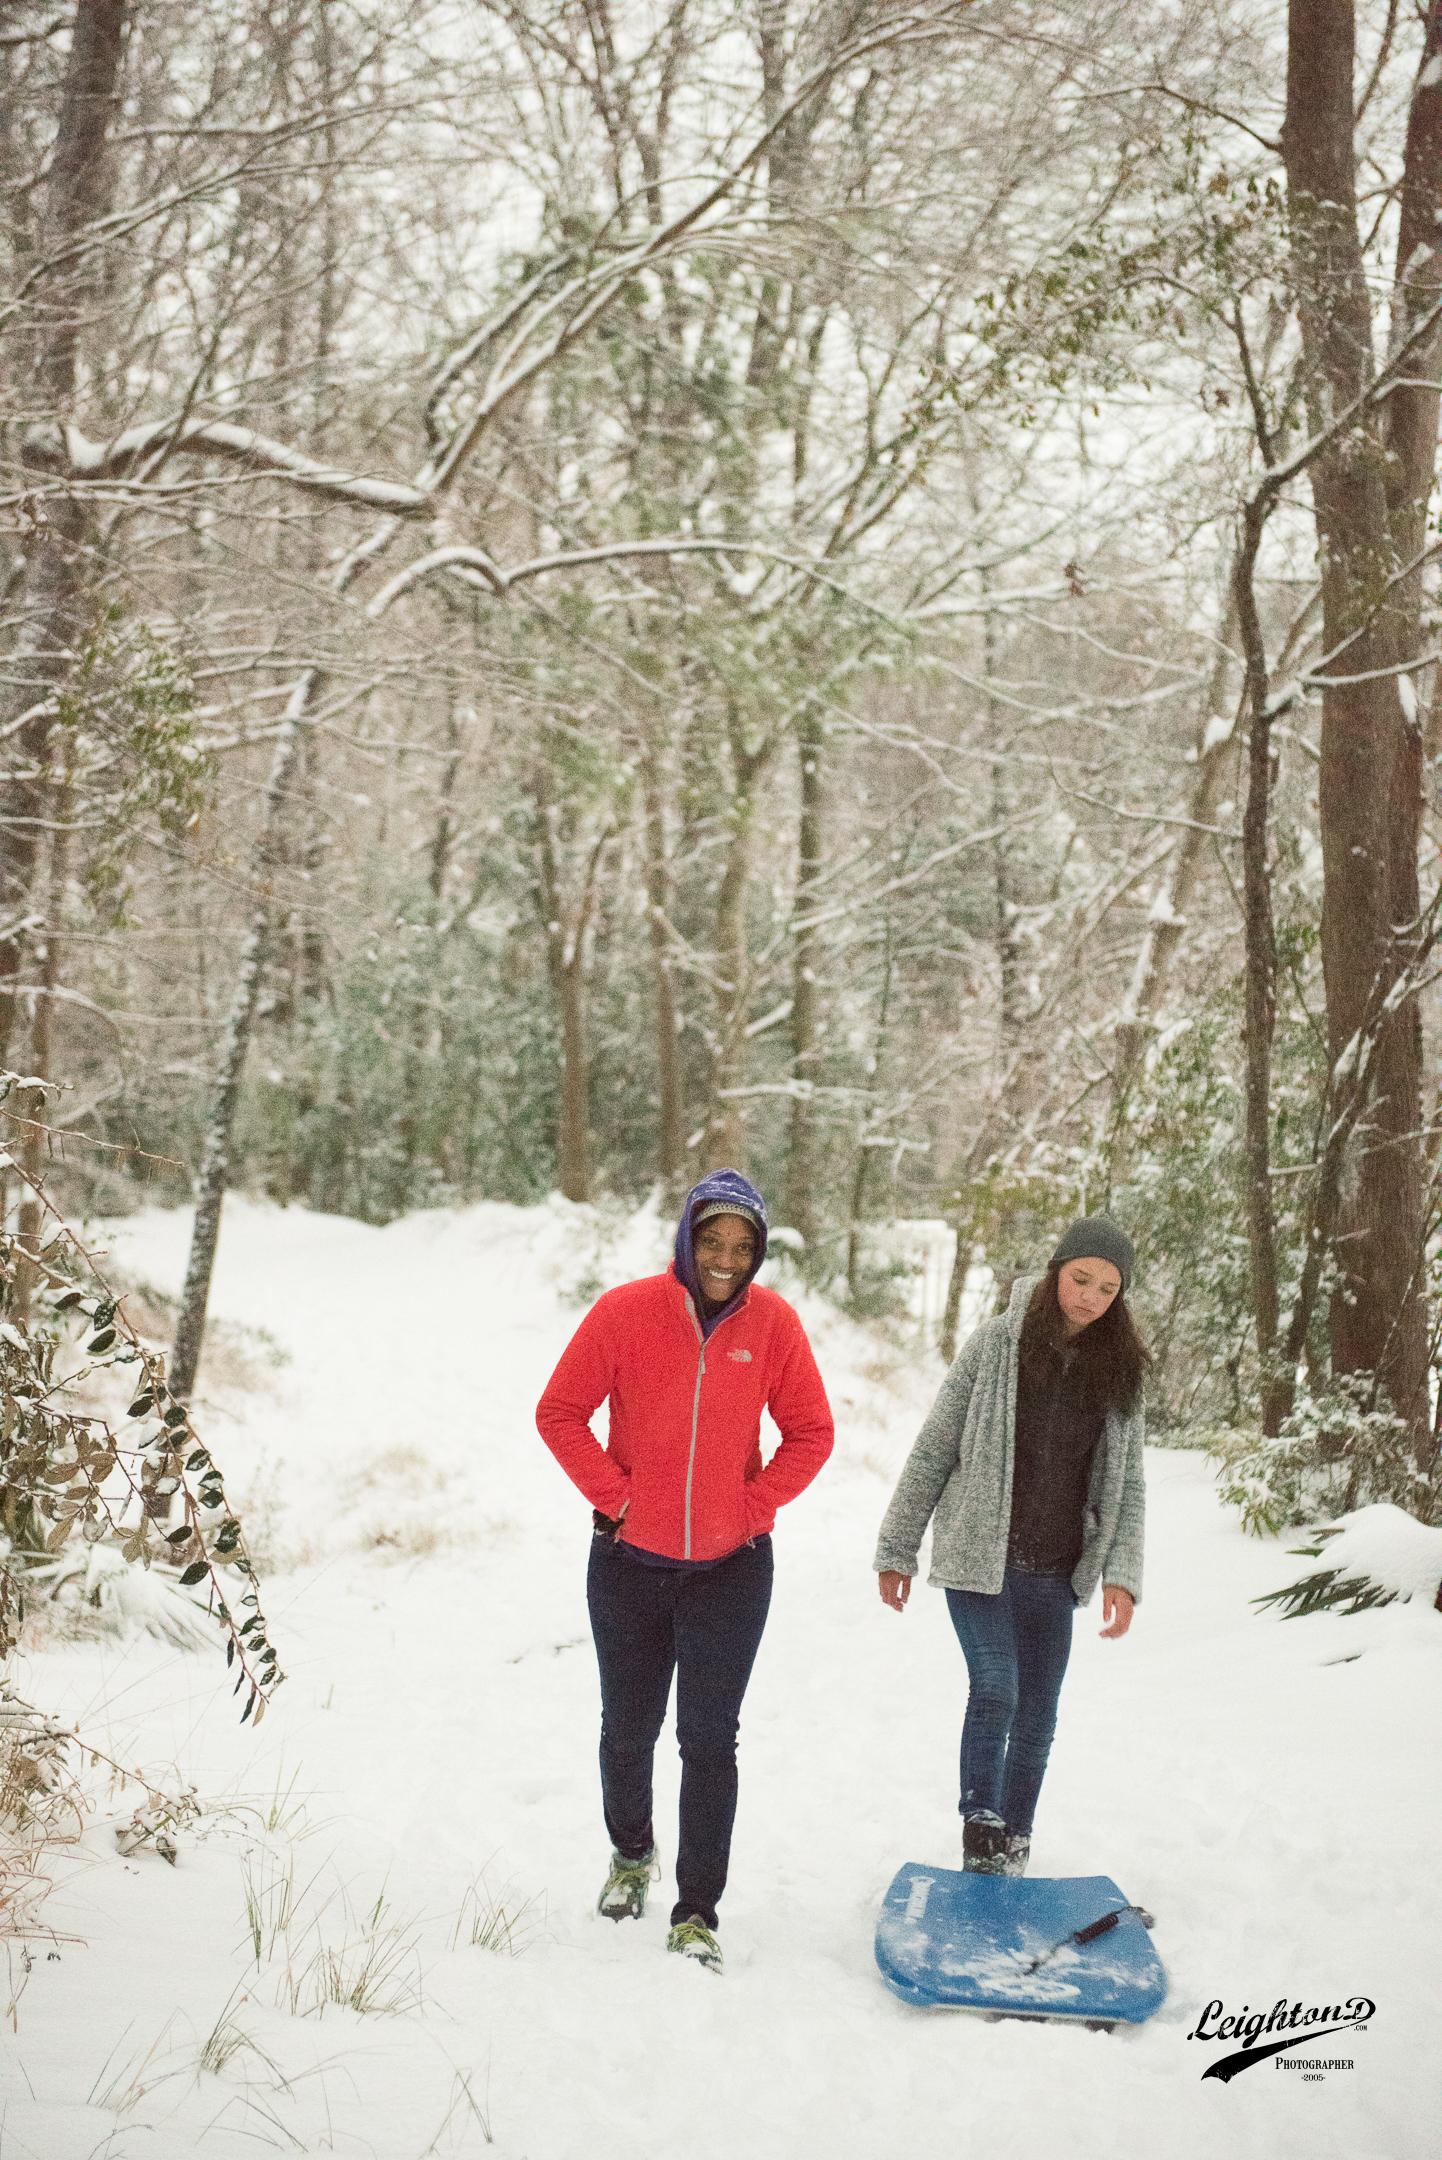 untitled-LeightonD-Charleston Snow Day-LeightonD-8865.jpg